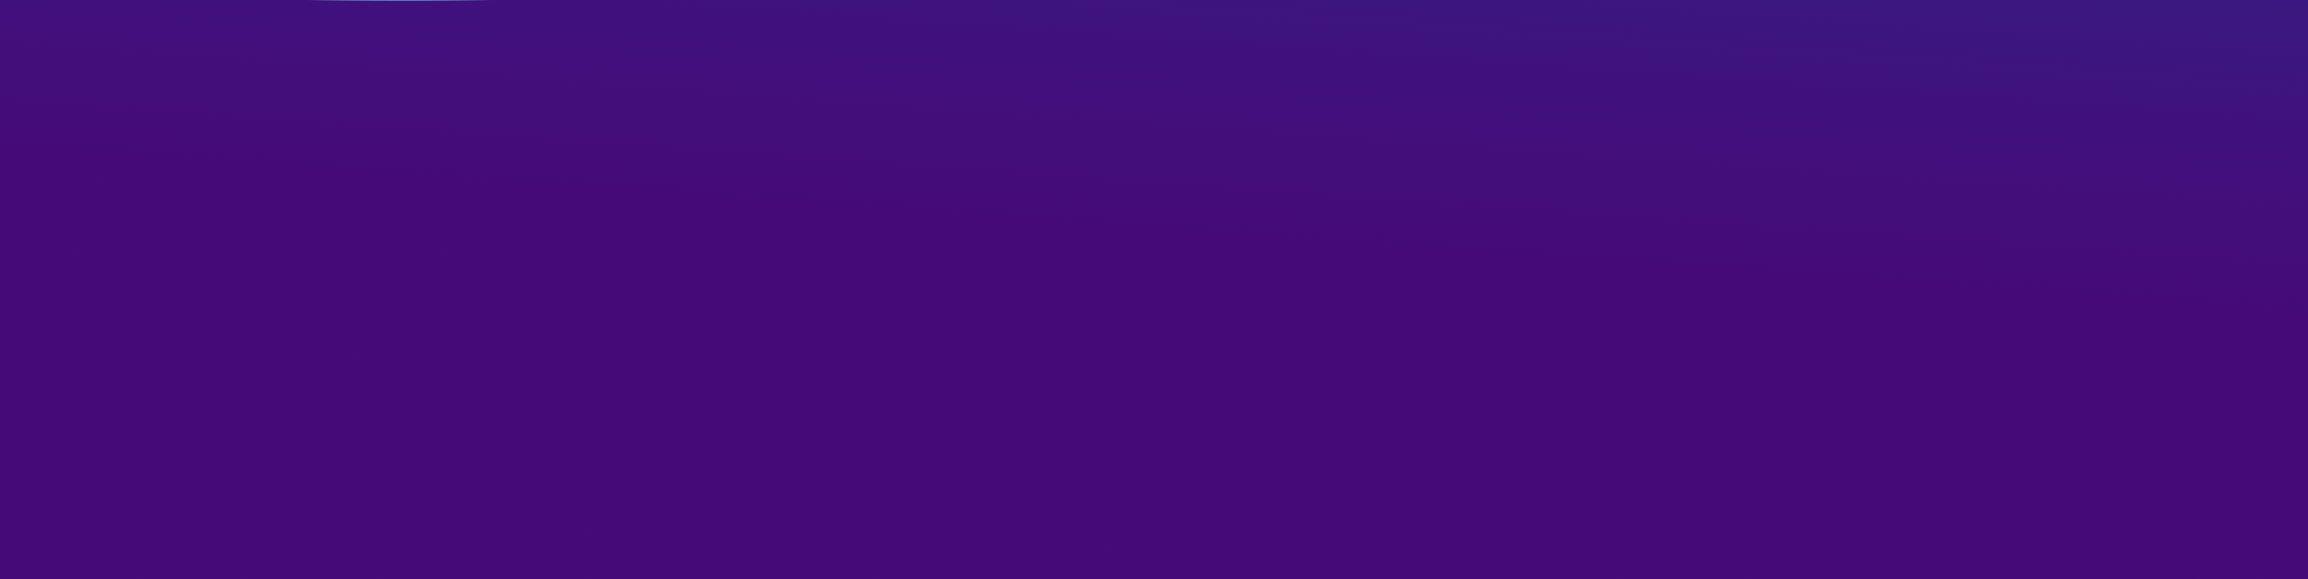 purple-copy-background